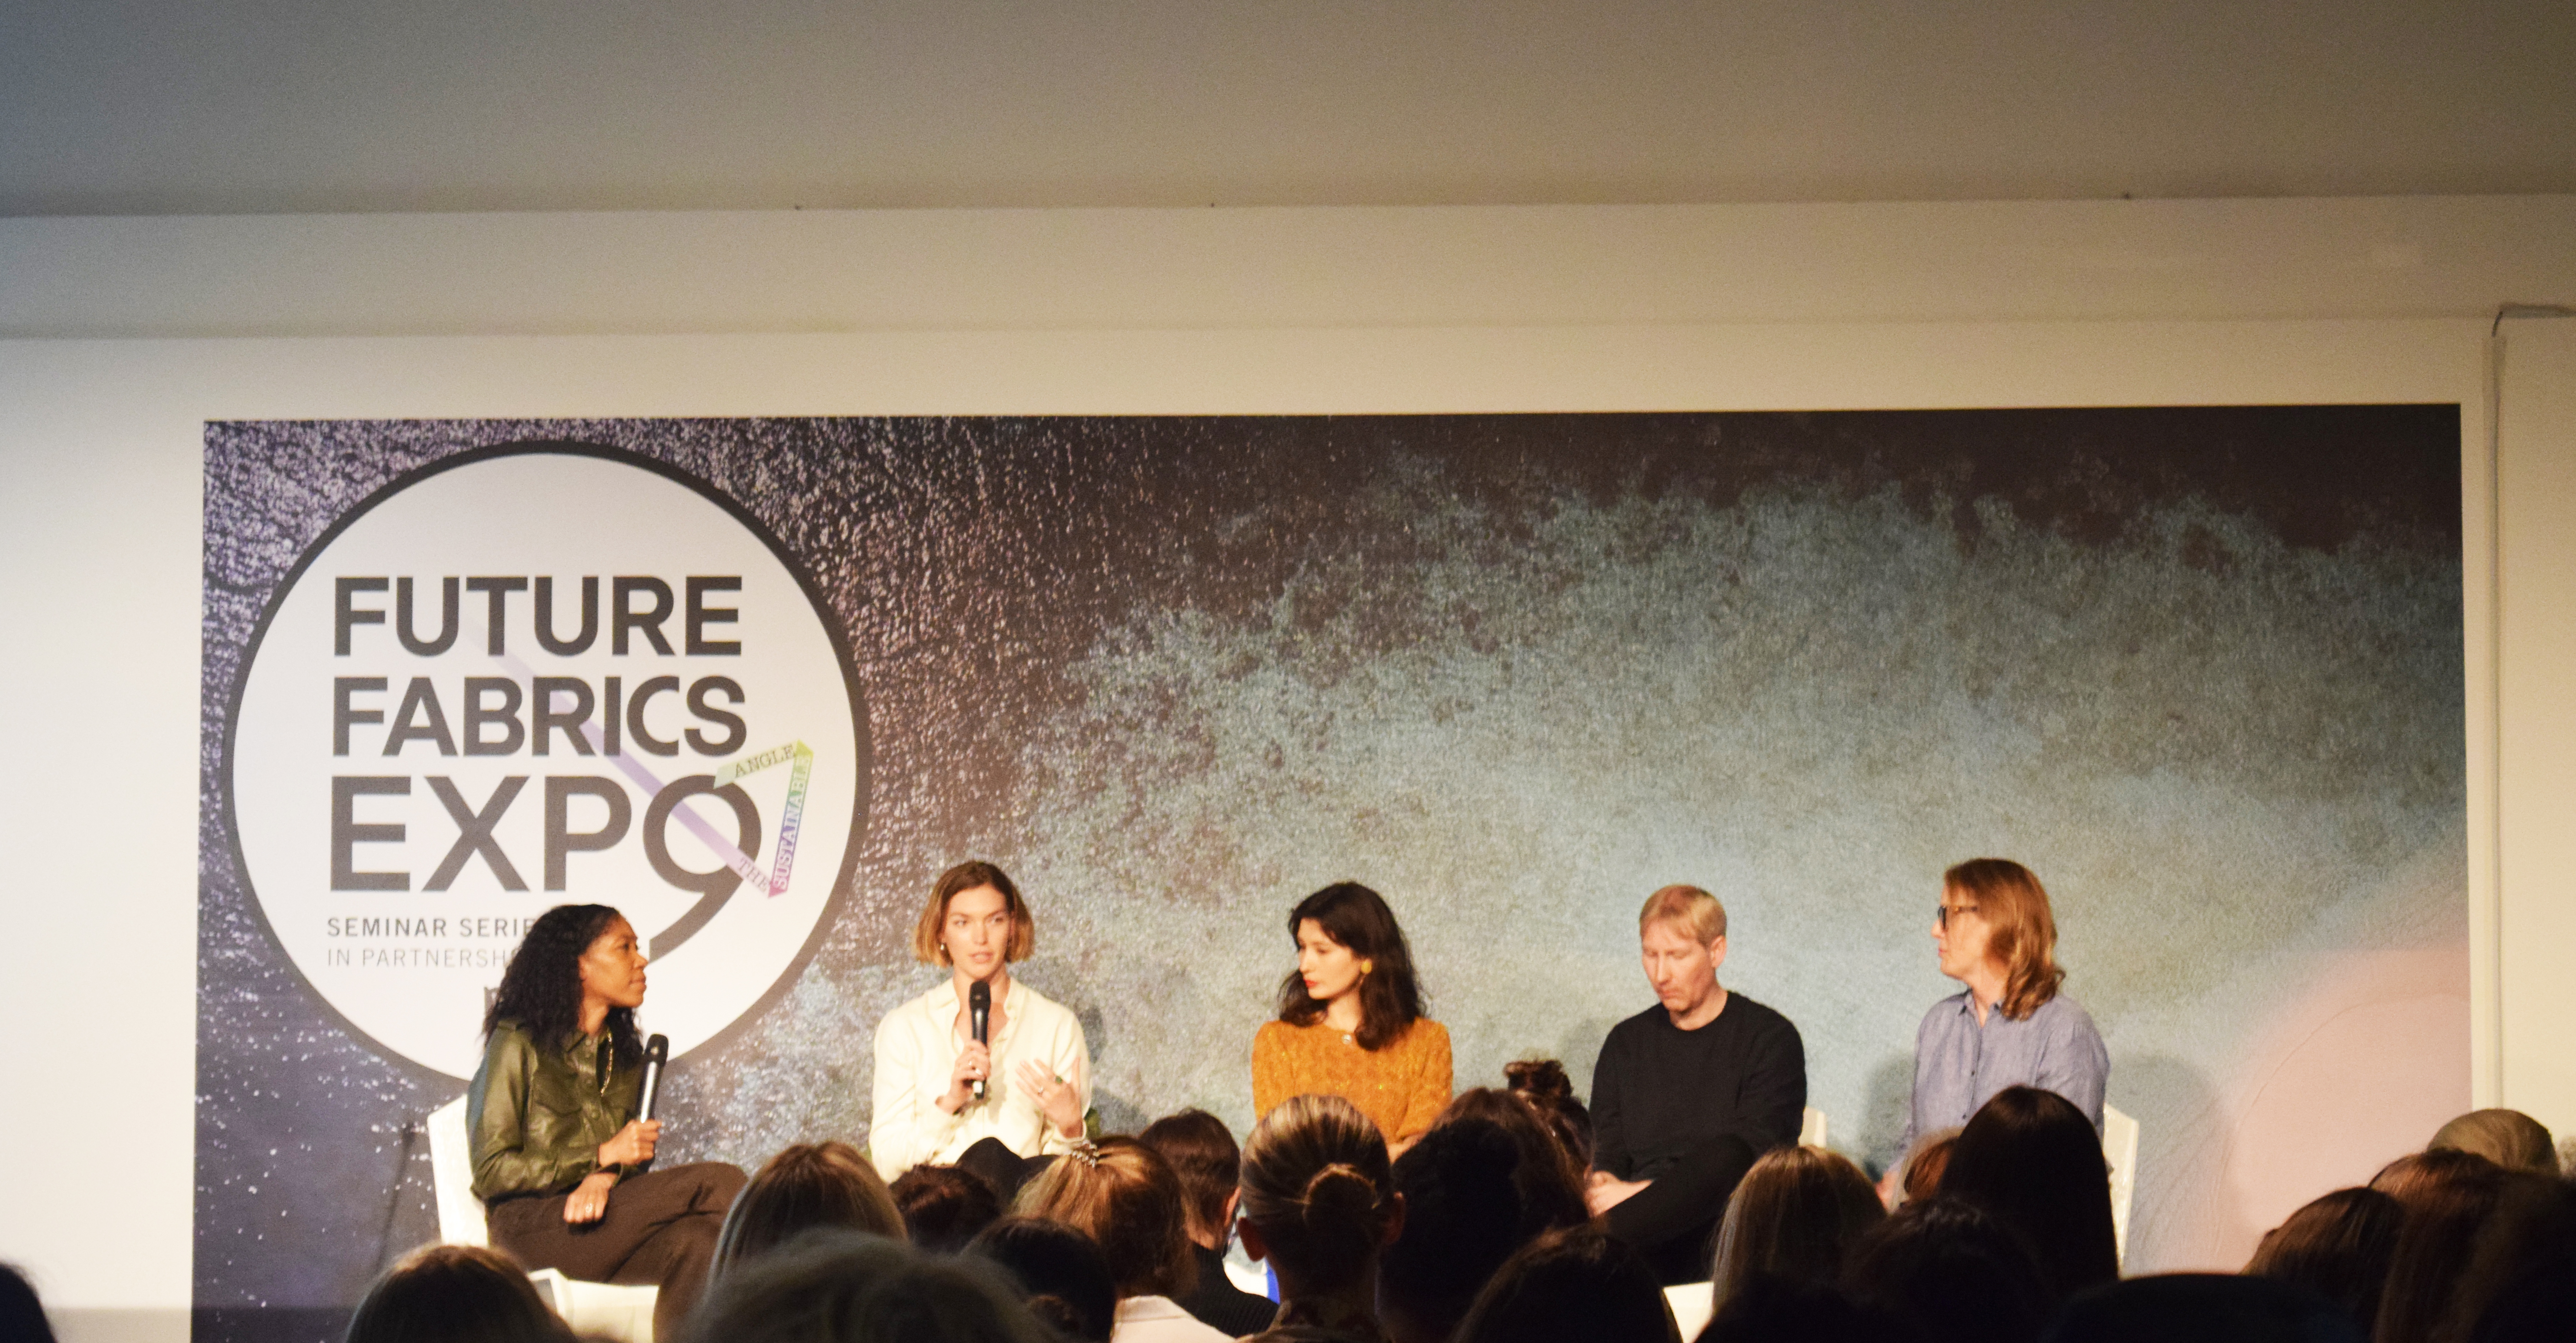 Panel talk at the Future Fabric expo Seminars